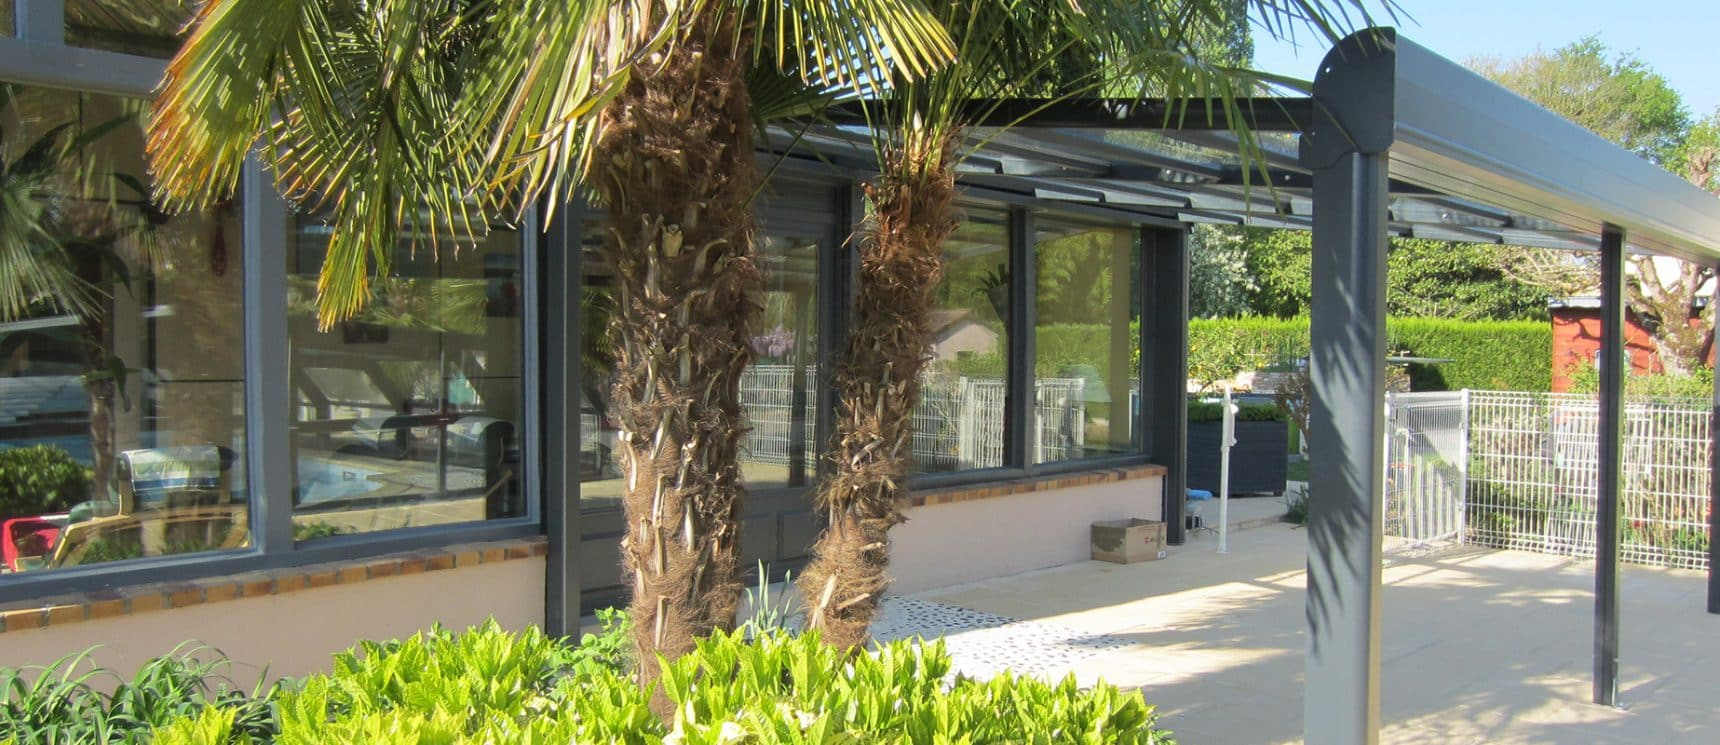 abri de terrasse en verre tremp de s curit protection terrasse. Black Bedroom Furniture Sets. Home Design Ideas